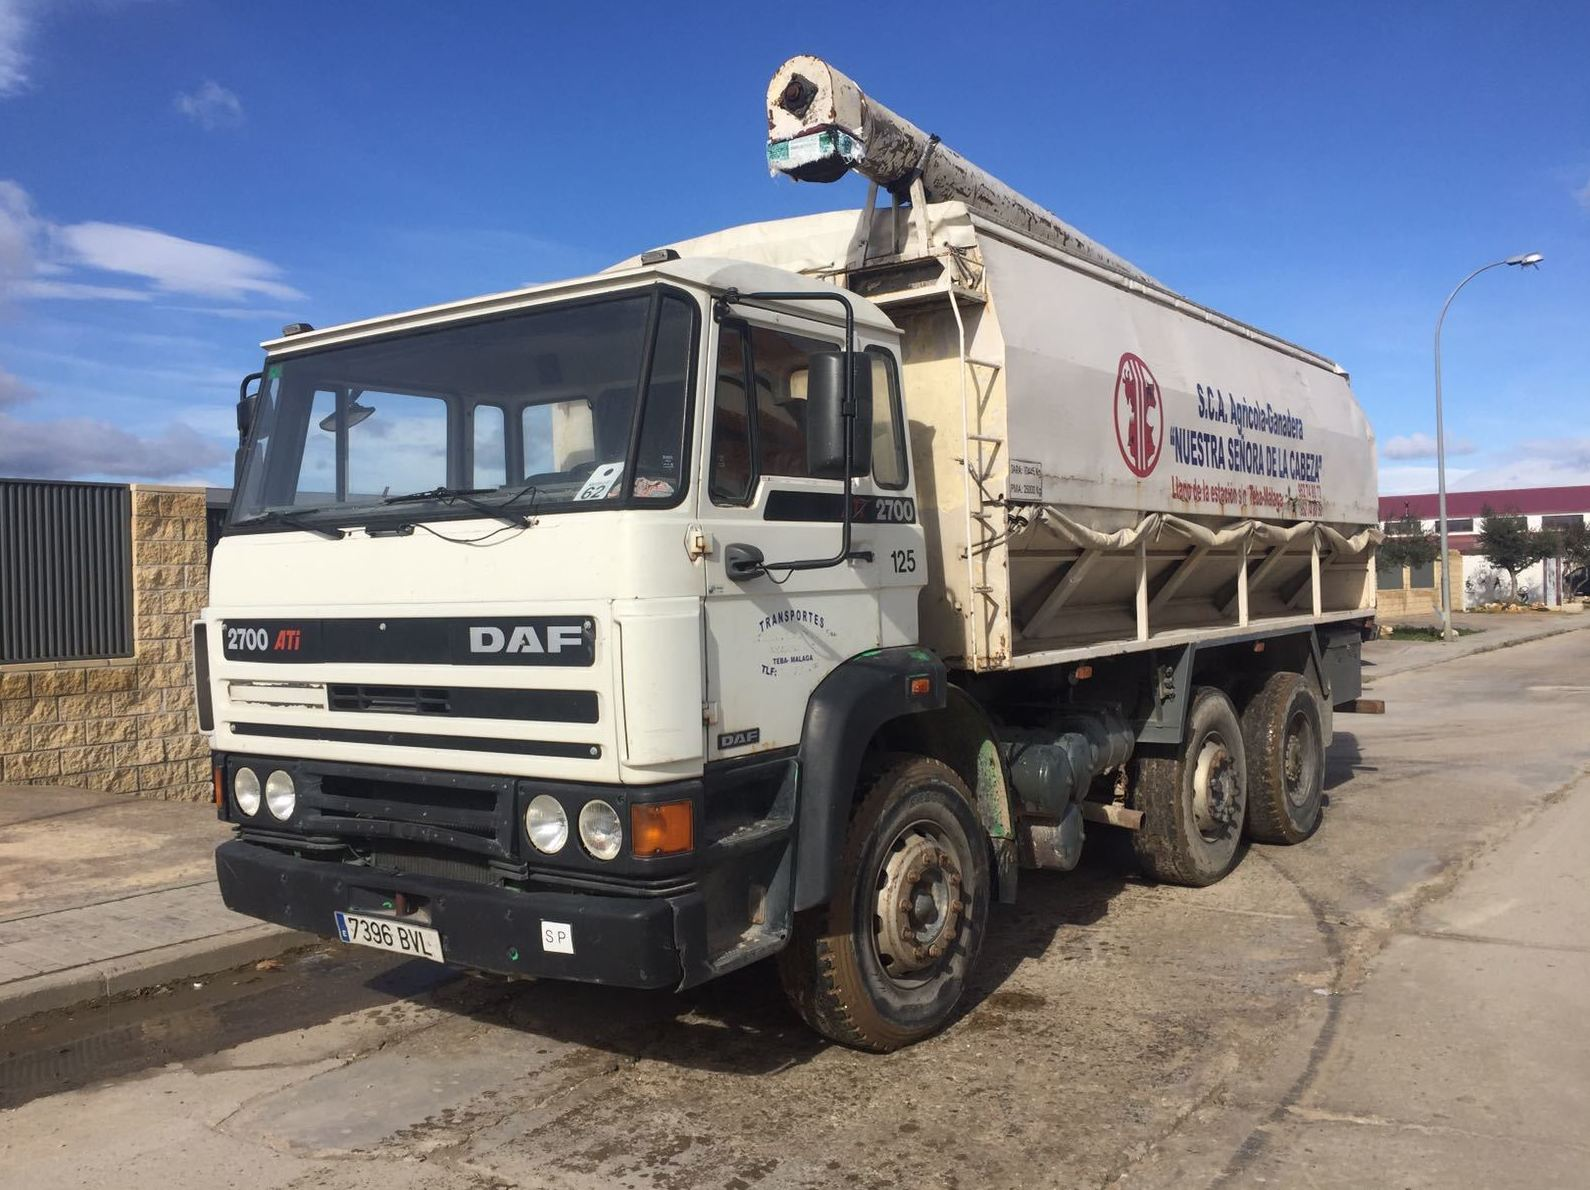 DAF 2700 6X4: Vehículos industriales de Emirtrucks Trading